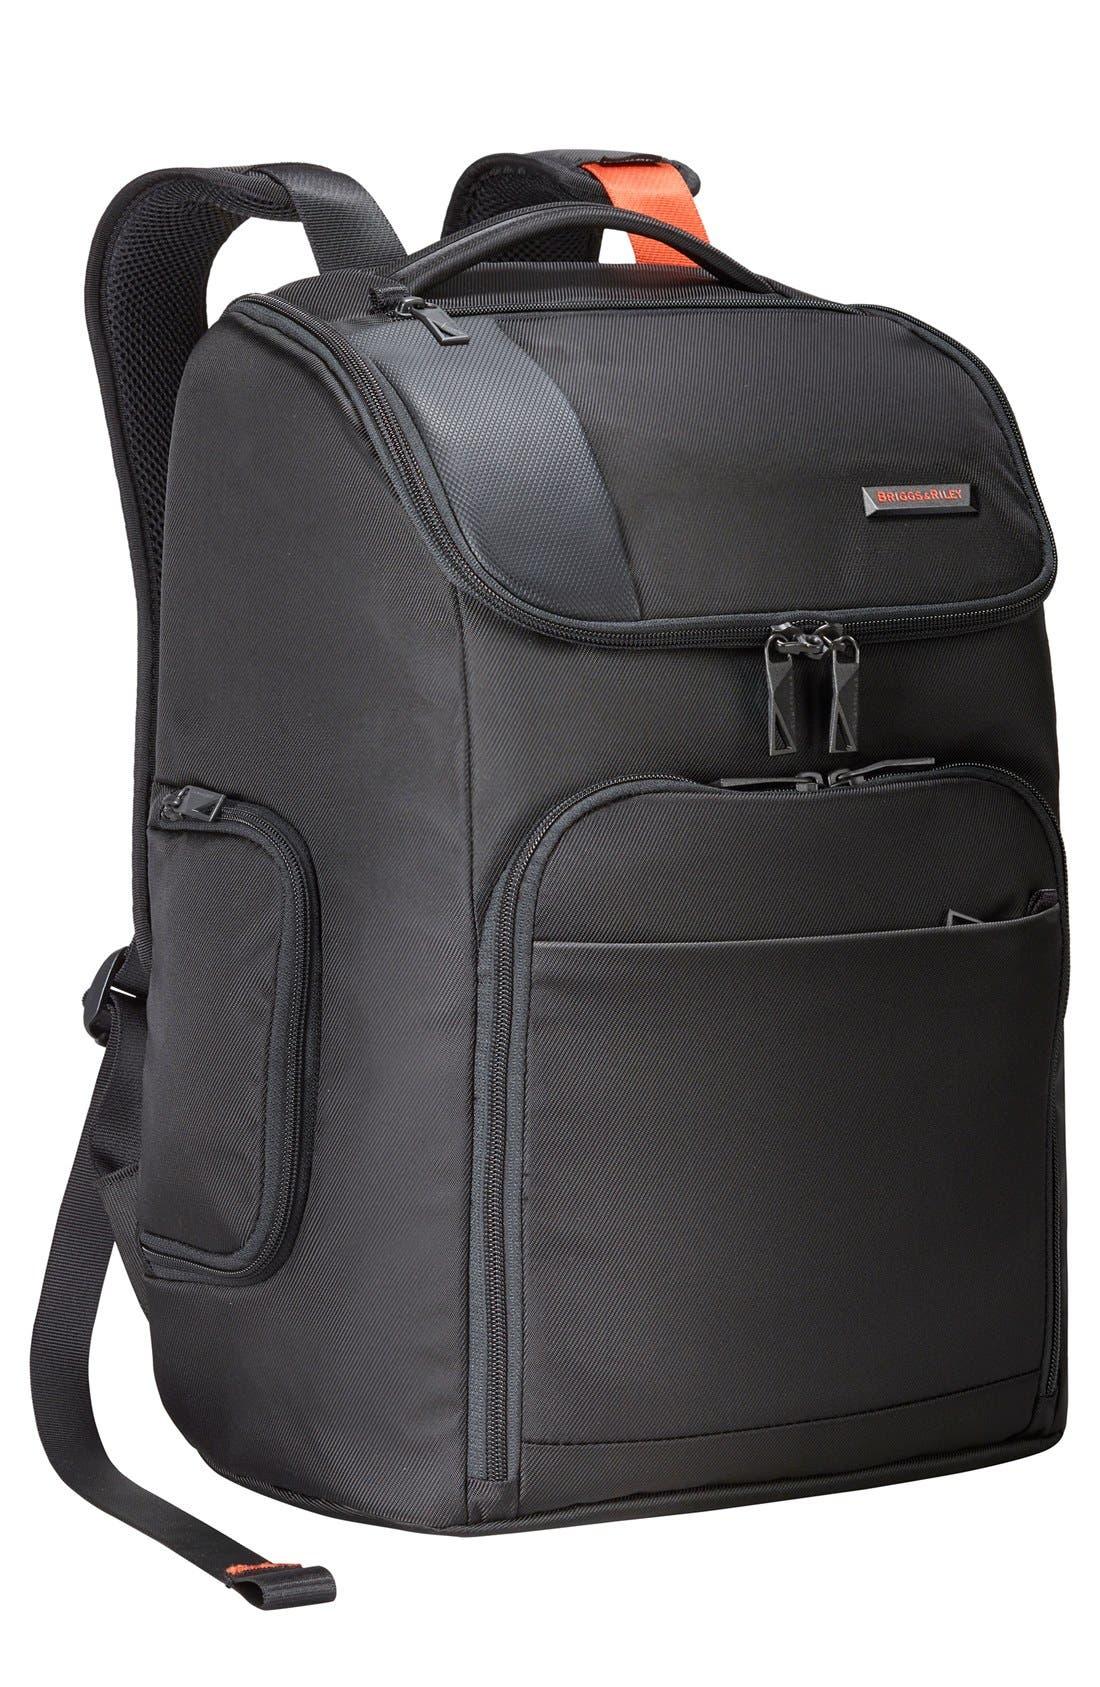 Briggs & Riley 'Verb - Advance' Water & Wear Resistant Ballistic Nylon Backpack